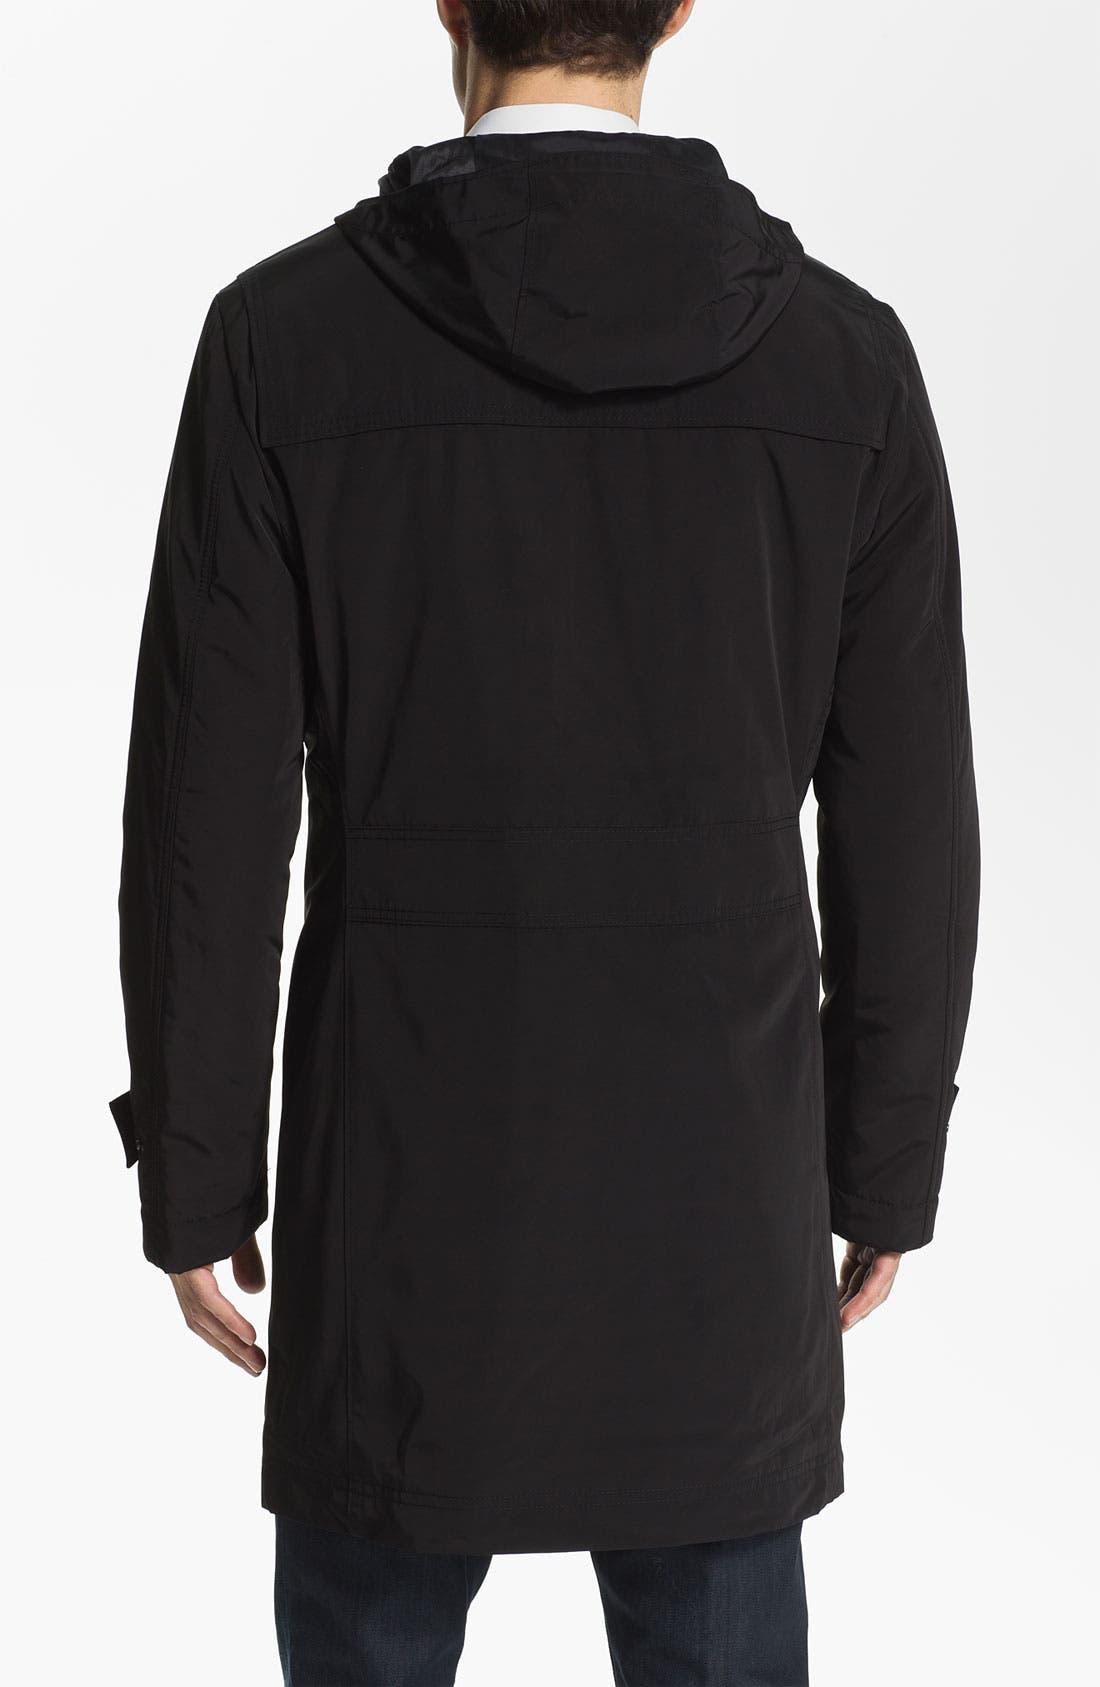 Alternate Image 2  - BOSS Black 'Glade' Wrinkle Resistant Duffle Coat